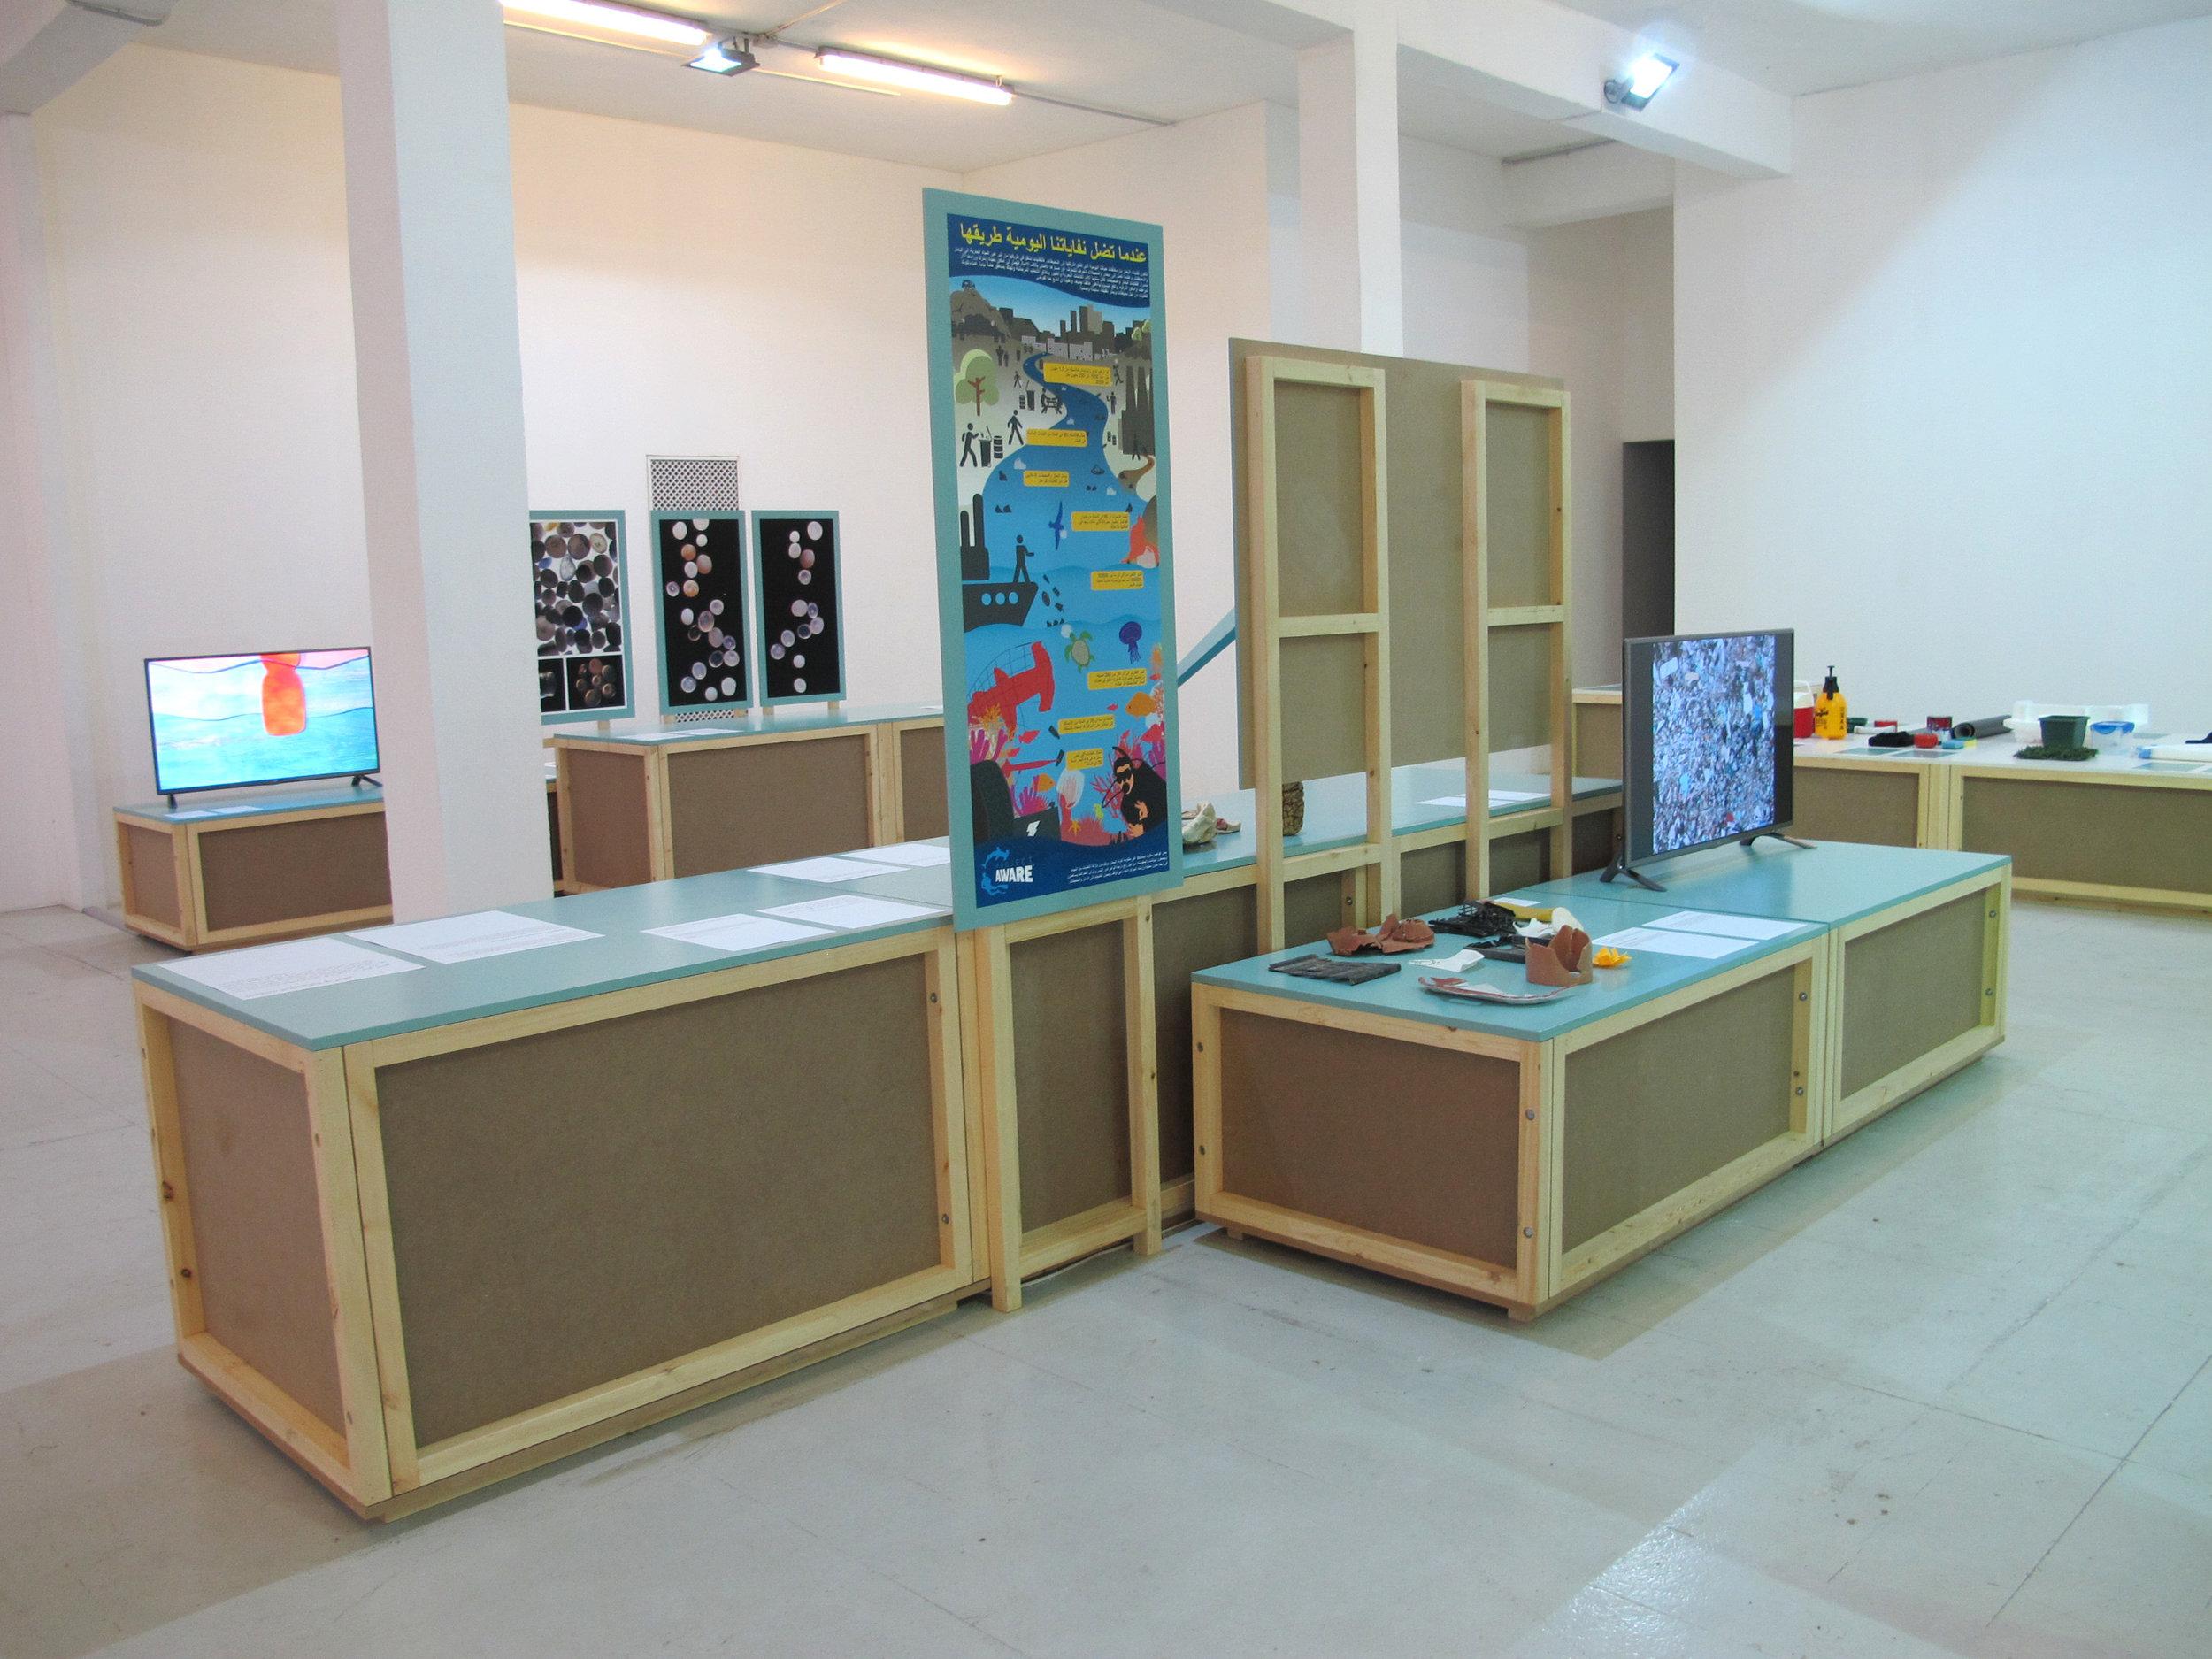 Exhibition_Lebanon_6.JPG